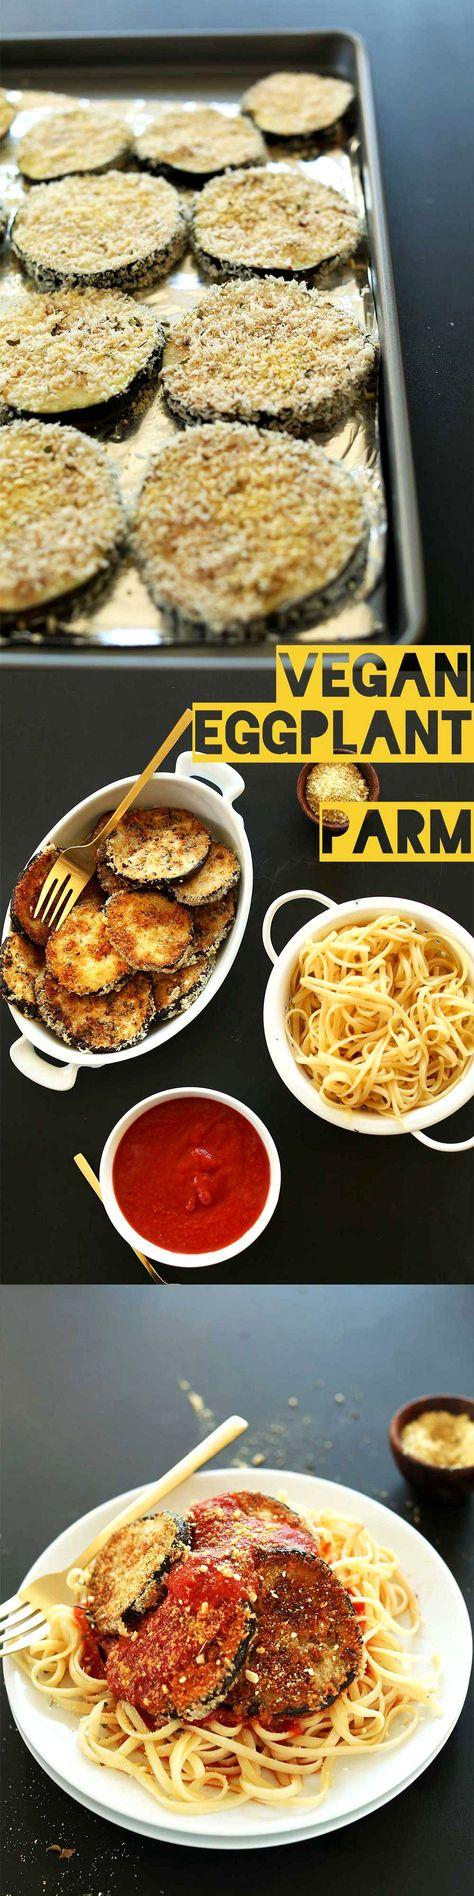 AMAZING, 10 -ingredient Vegan Eggplant Parmesan! You'd never guess the egg went missing. #vegan #healthy